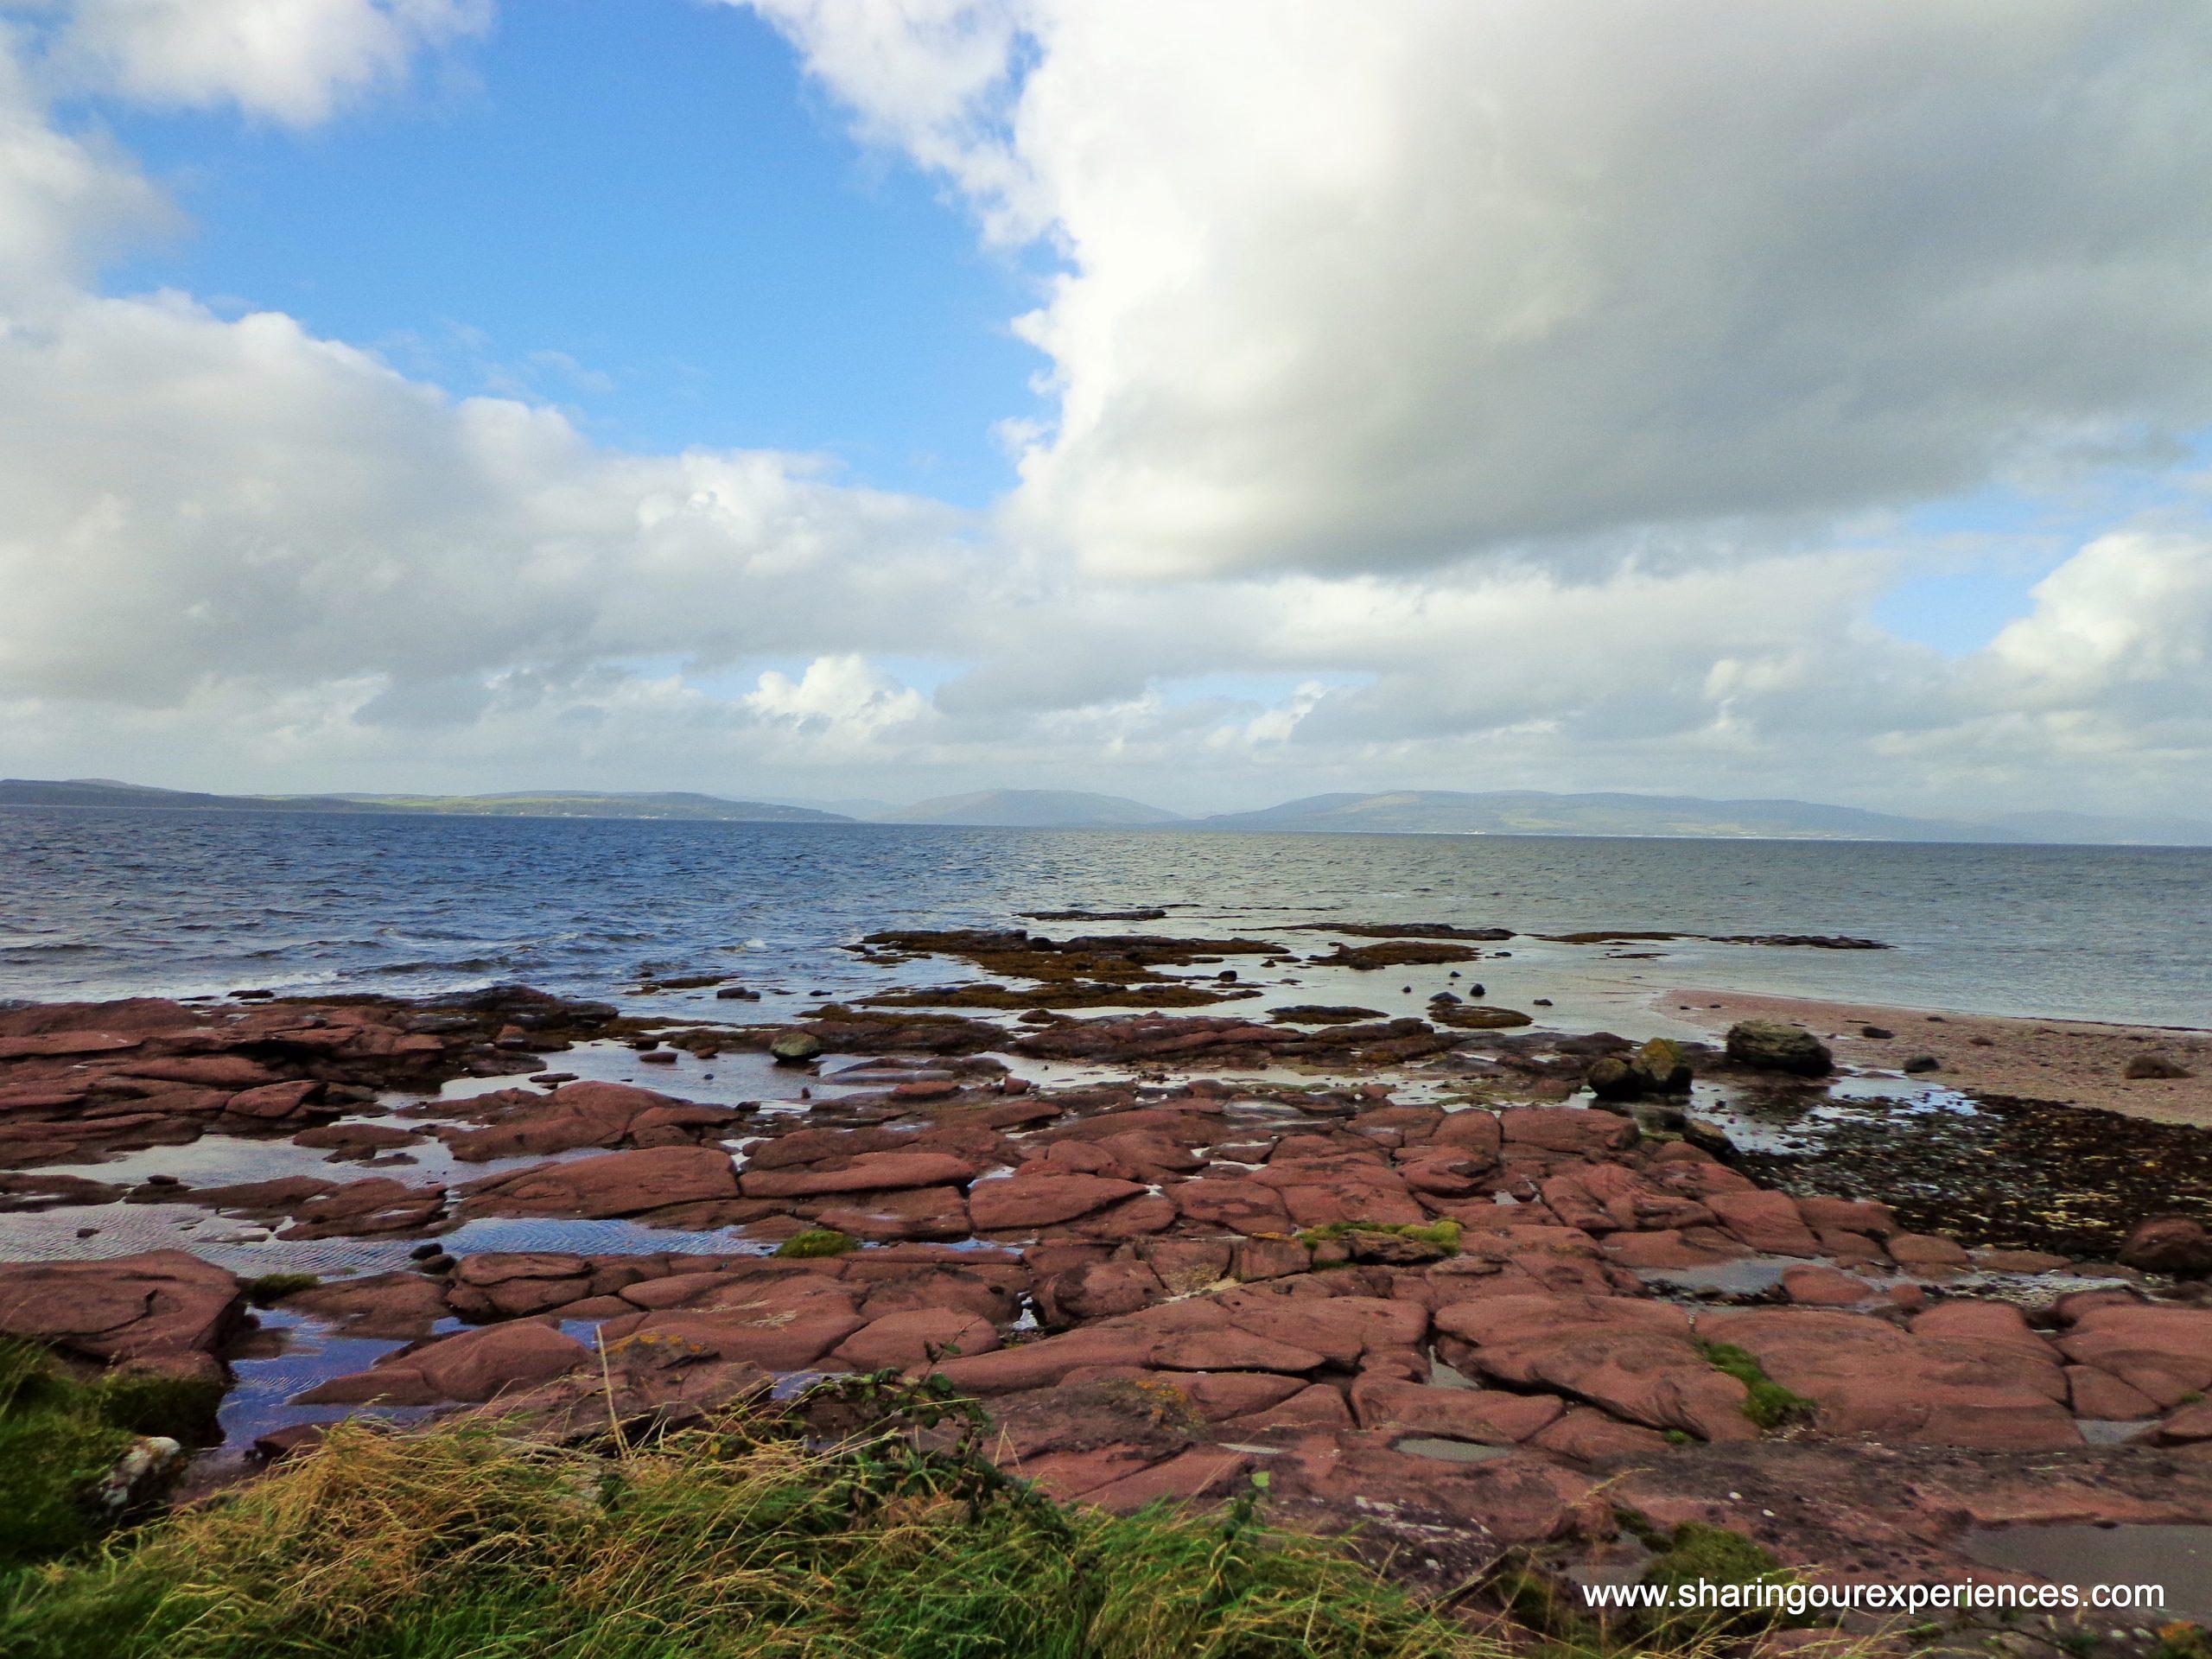 Day trip to Millport Isle of Cumbrae from Edinburgh Glasgow 8